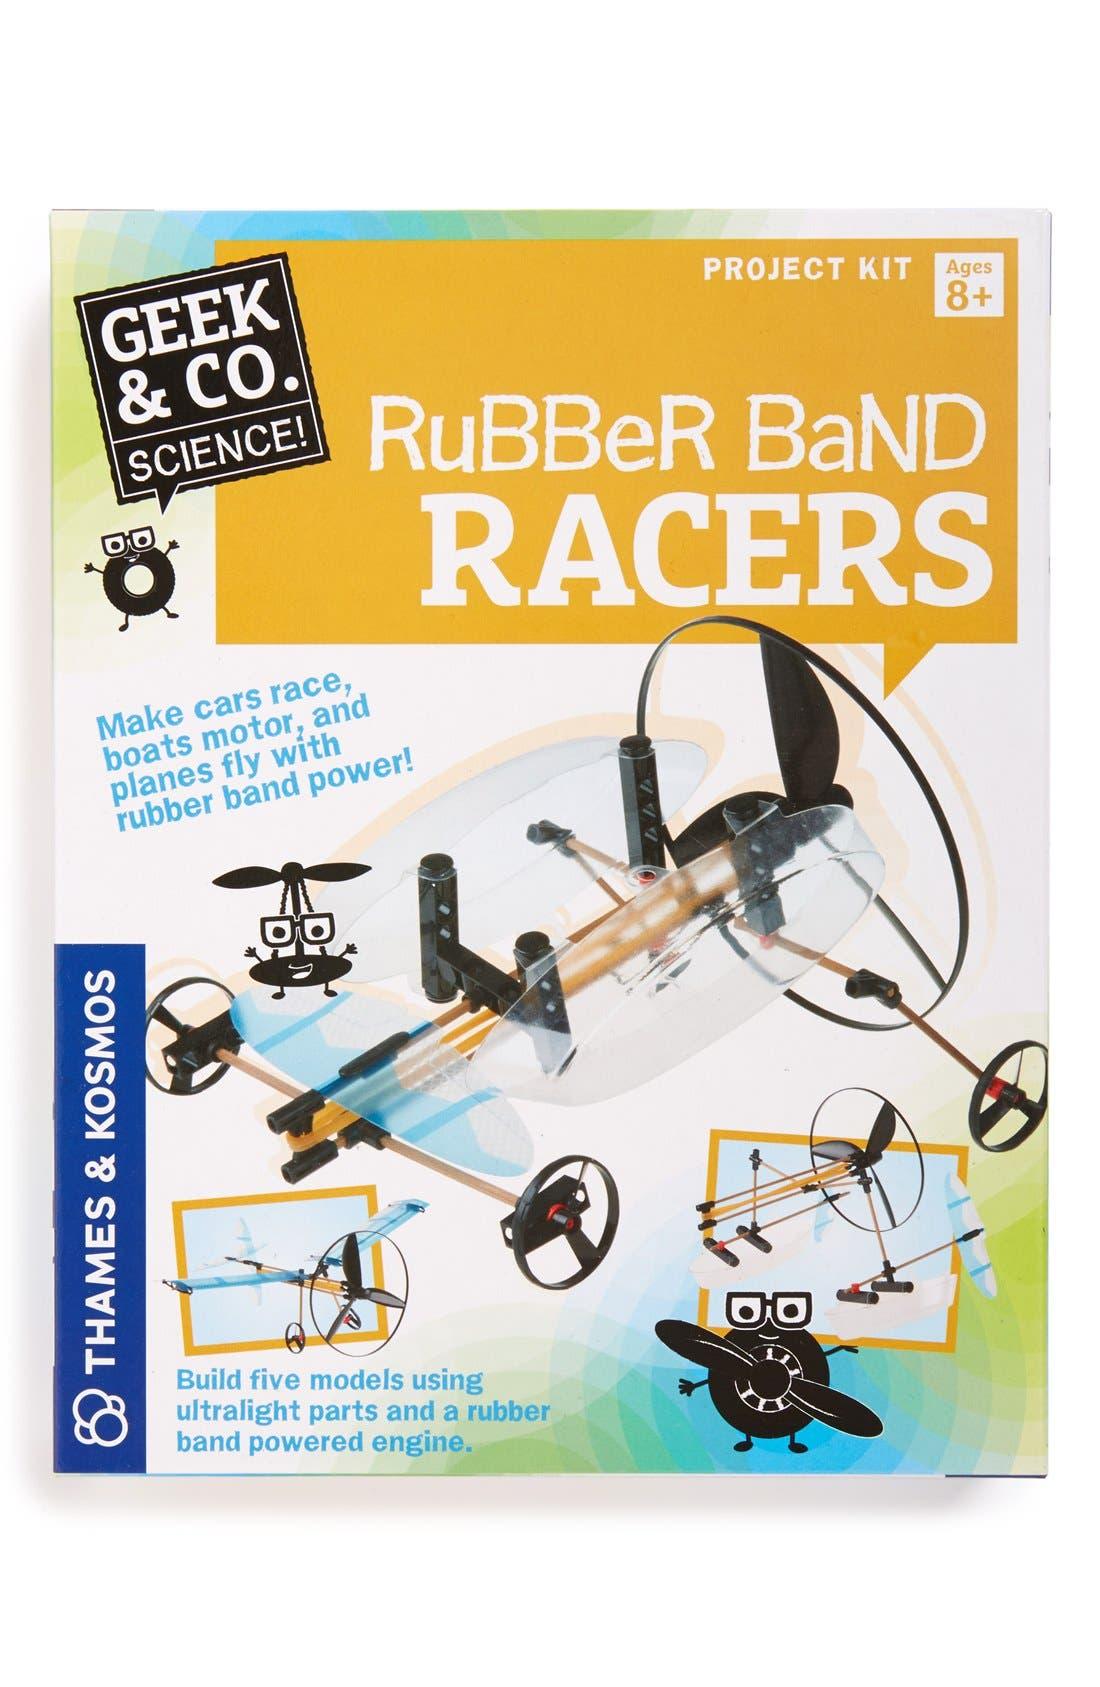 Thames & Kosmos 'Rubber Band Racers' Kit